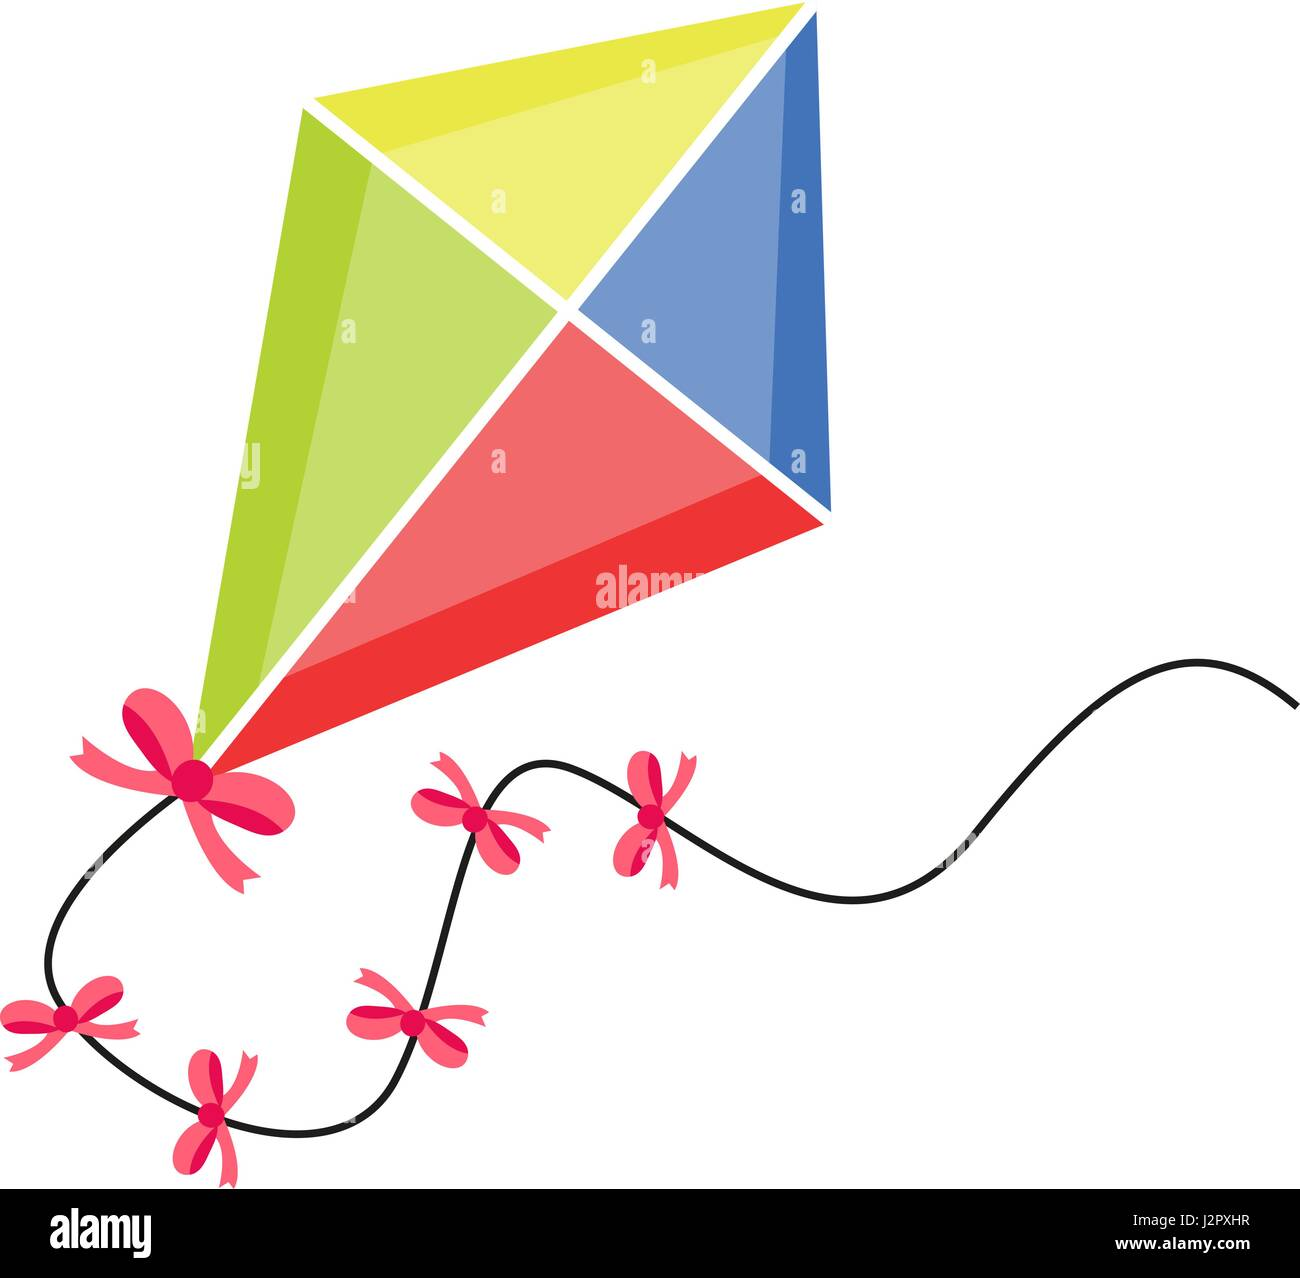 Cerf Volant Television Icone De Style Dessin Anime Isole Sur Fond Blanc Illustration Vectorielle Clip Art Image Vectorielle Stock Alamy